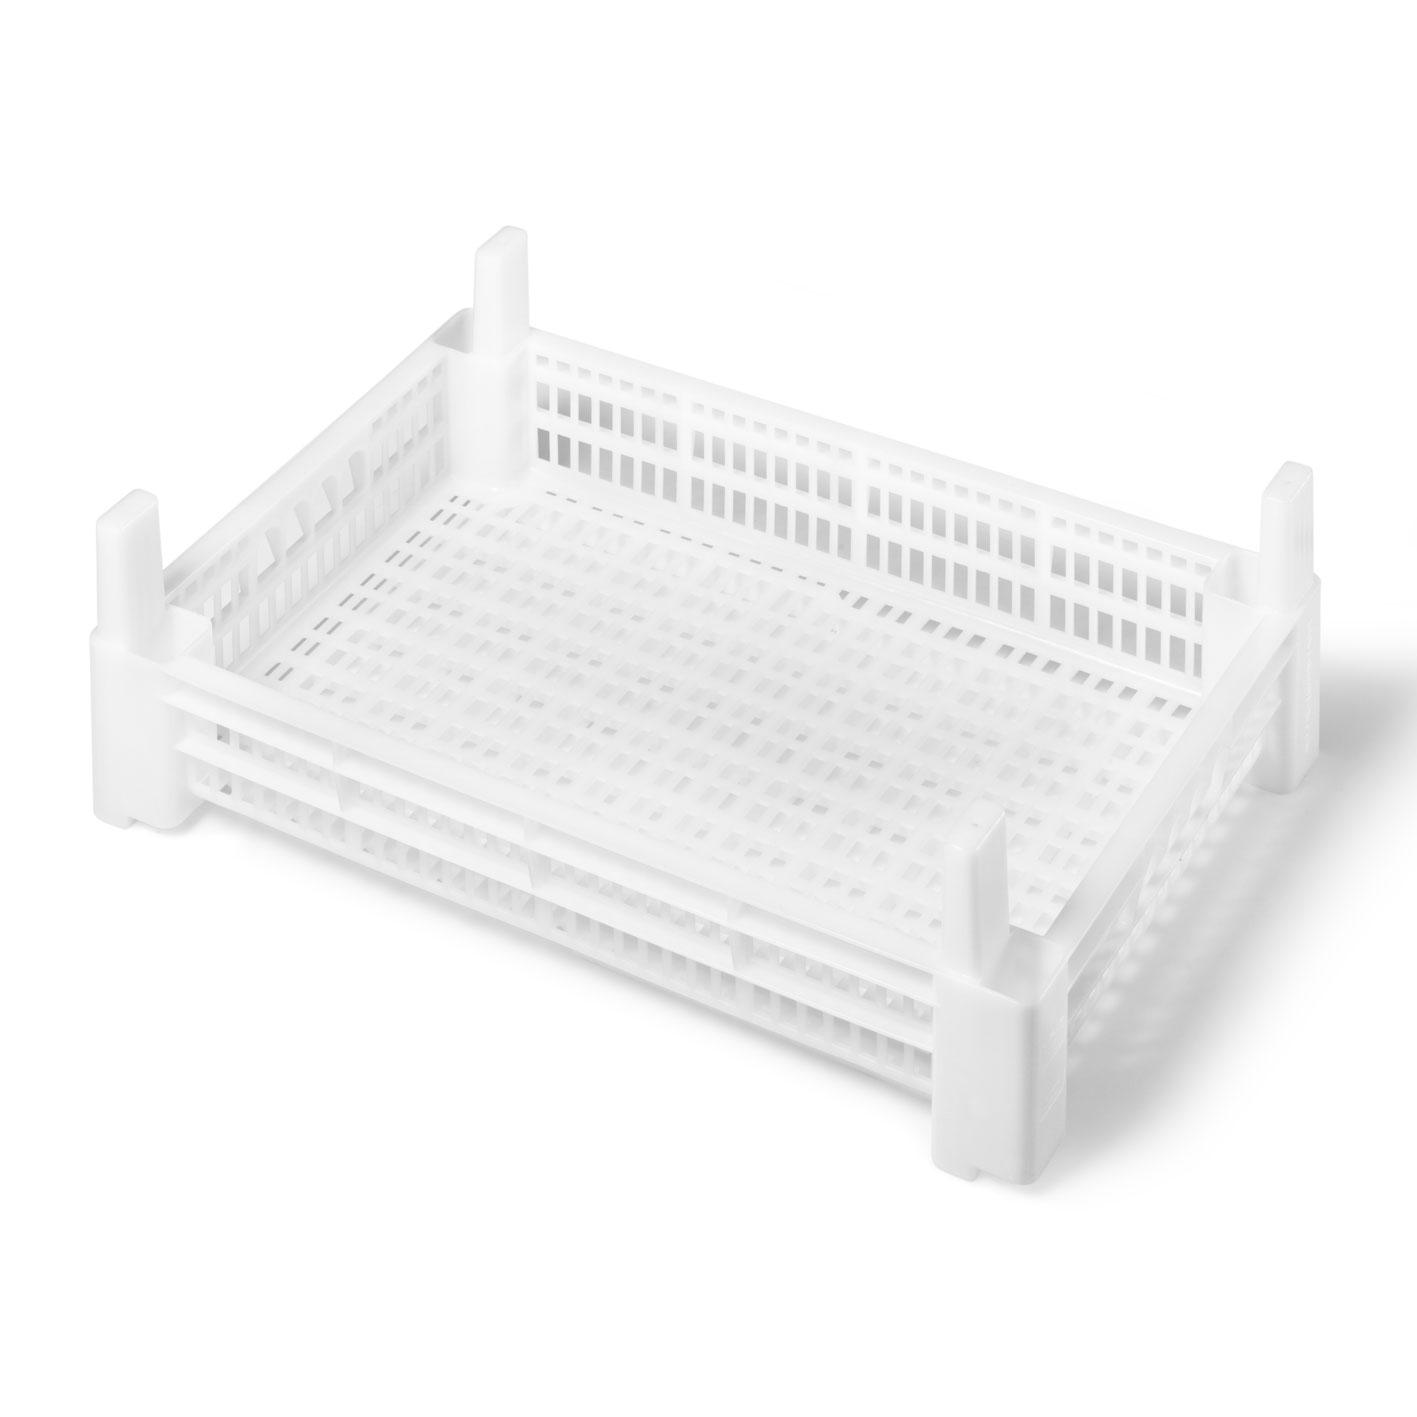 18 liter Chitting tray - 2